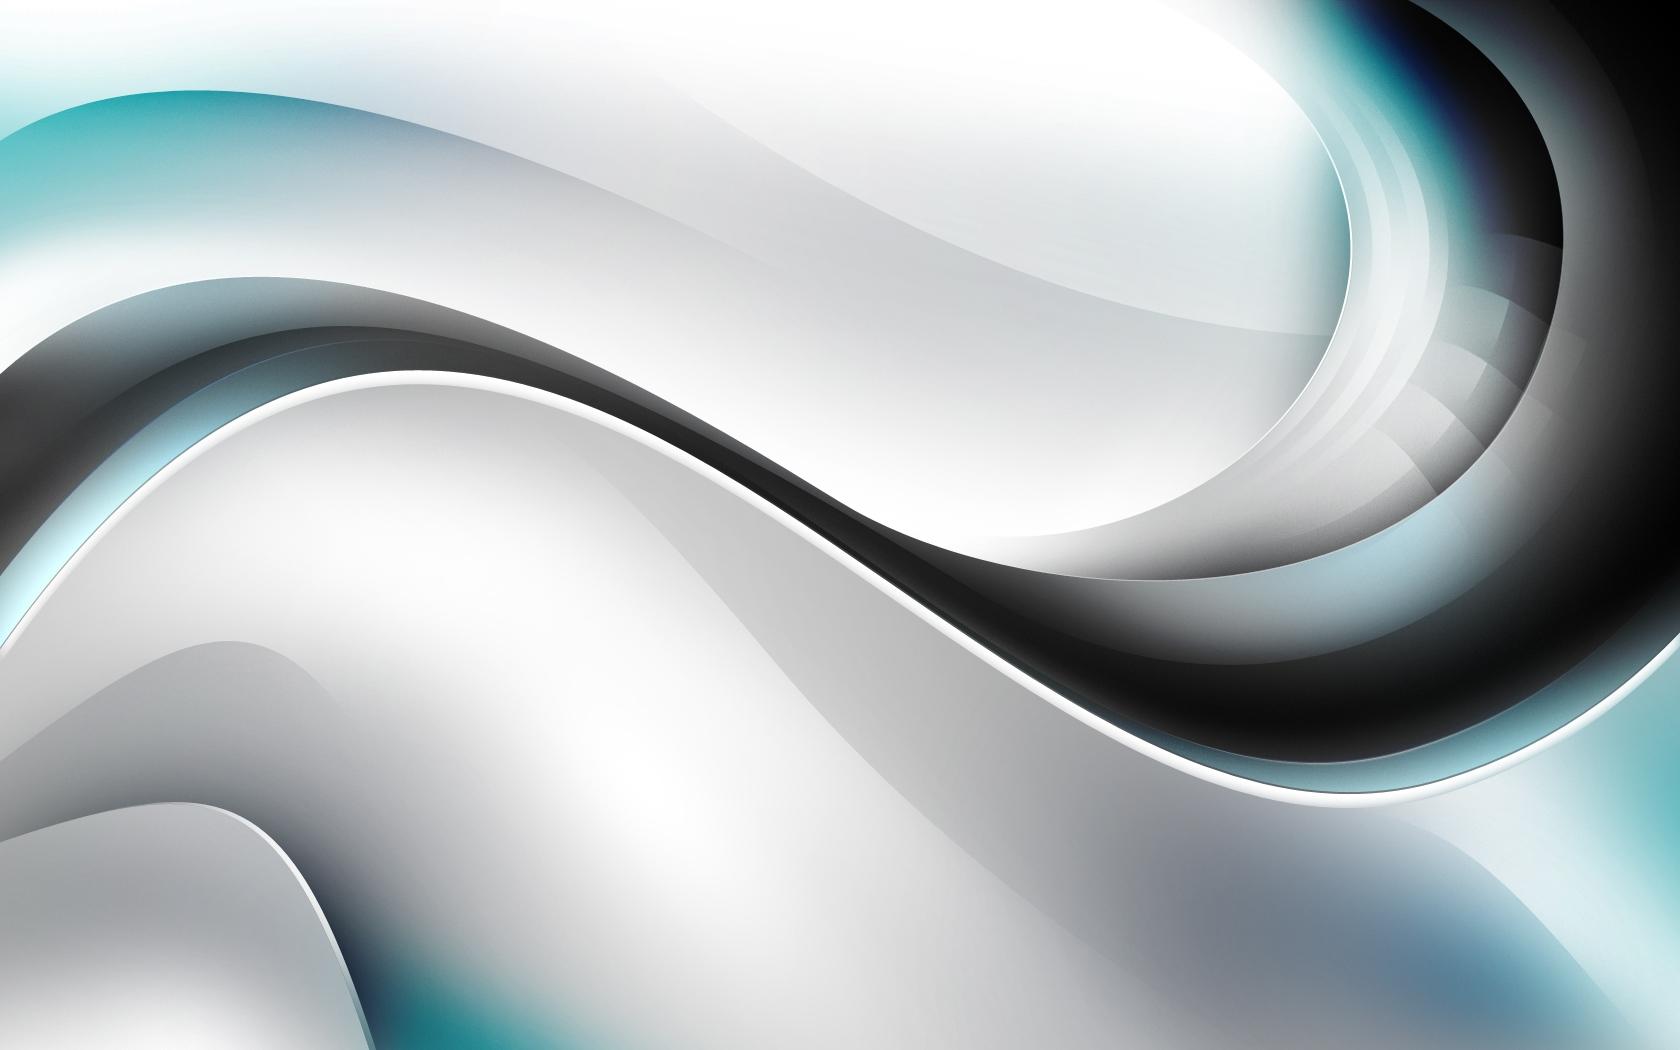 White Black Sky Green Blue Circle Gray Angle Line Graphics Computer Wallpaper Automotive Design Font Close